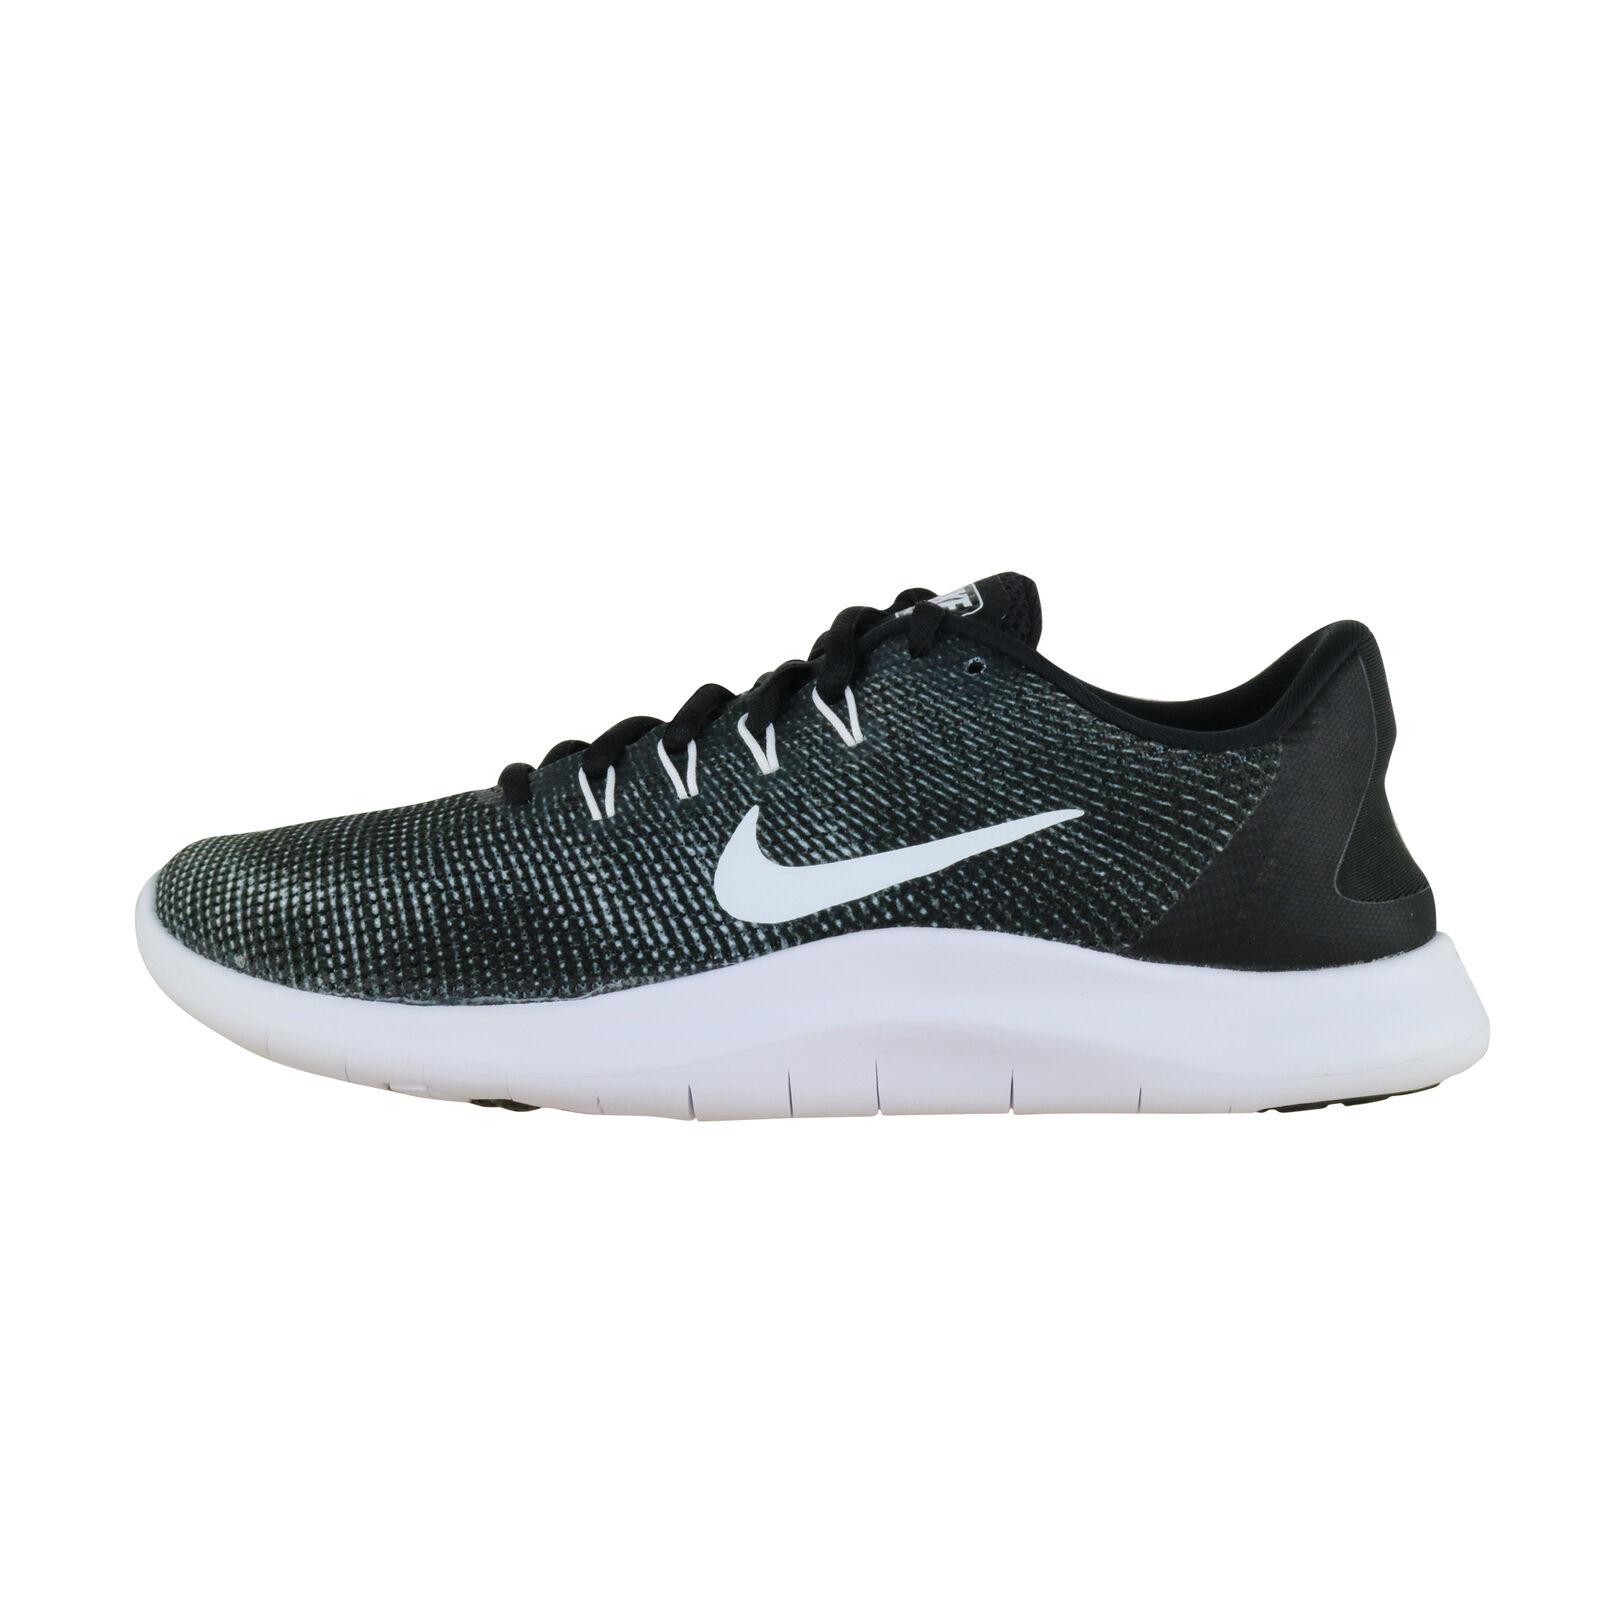 official photos 9b04c c28b3 Womens Nike Flex 2018 RN Run Running Shoes Aa7408-001 Sz 8 Black